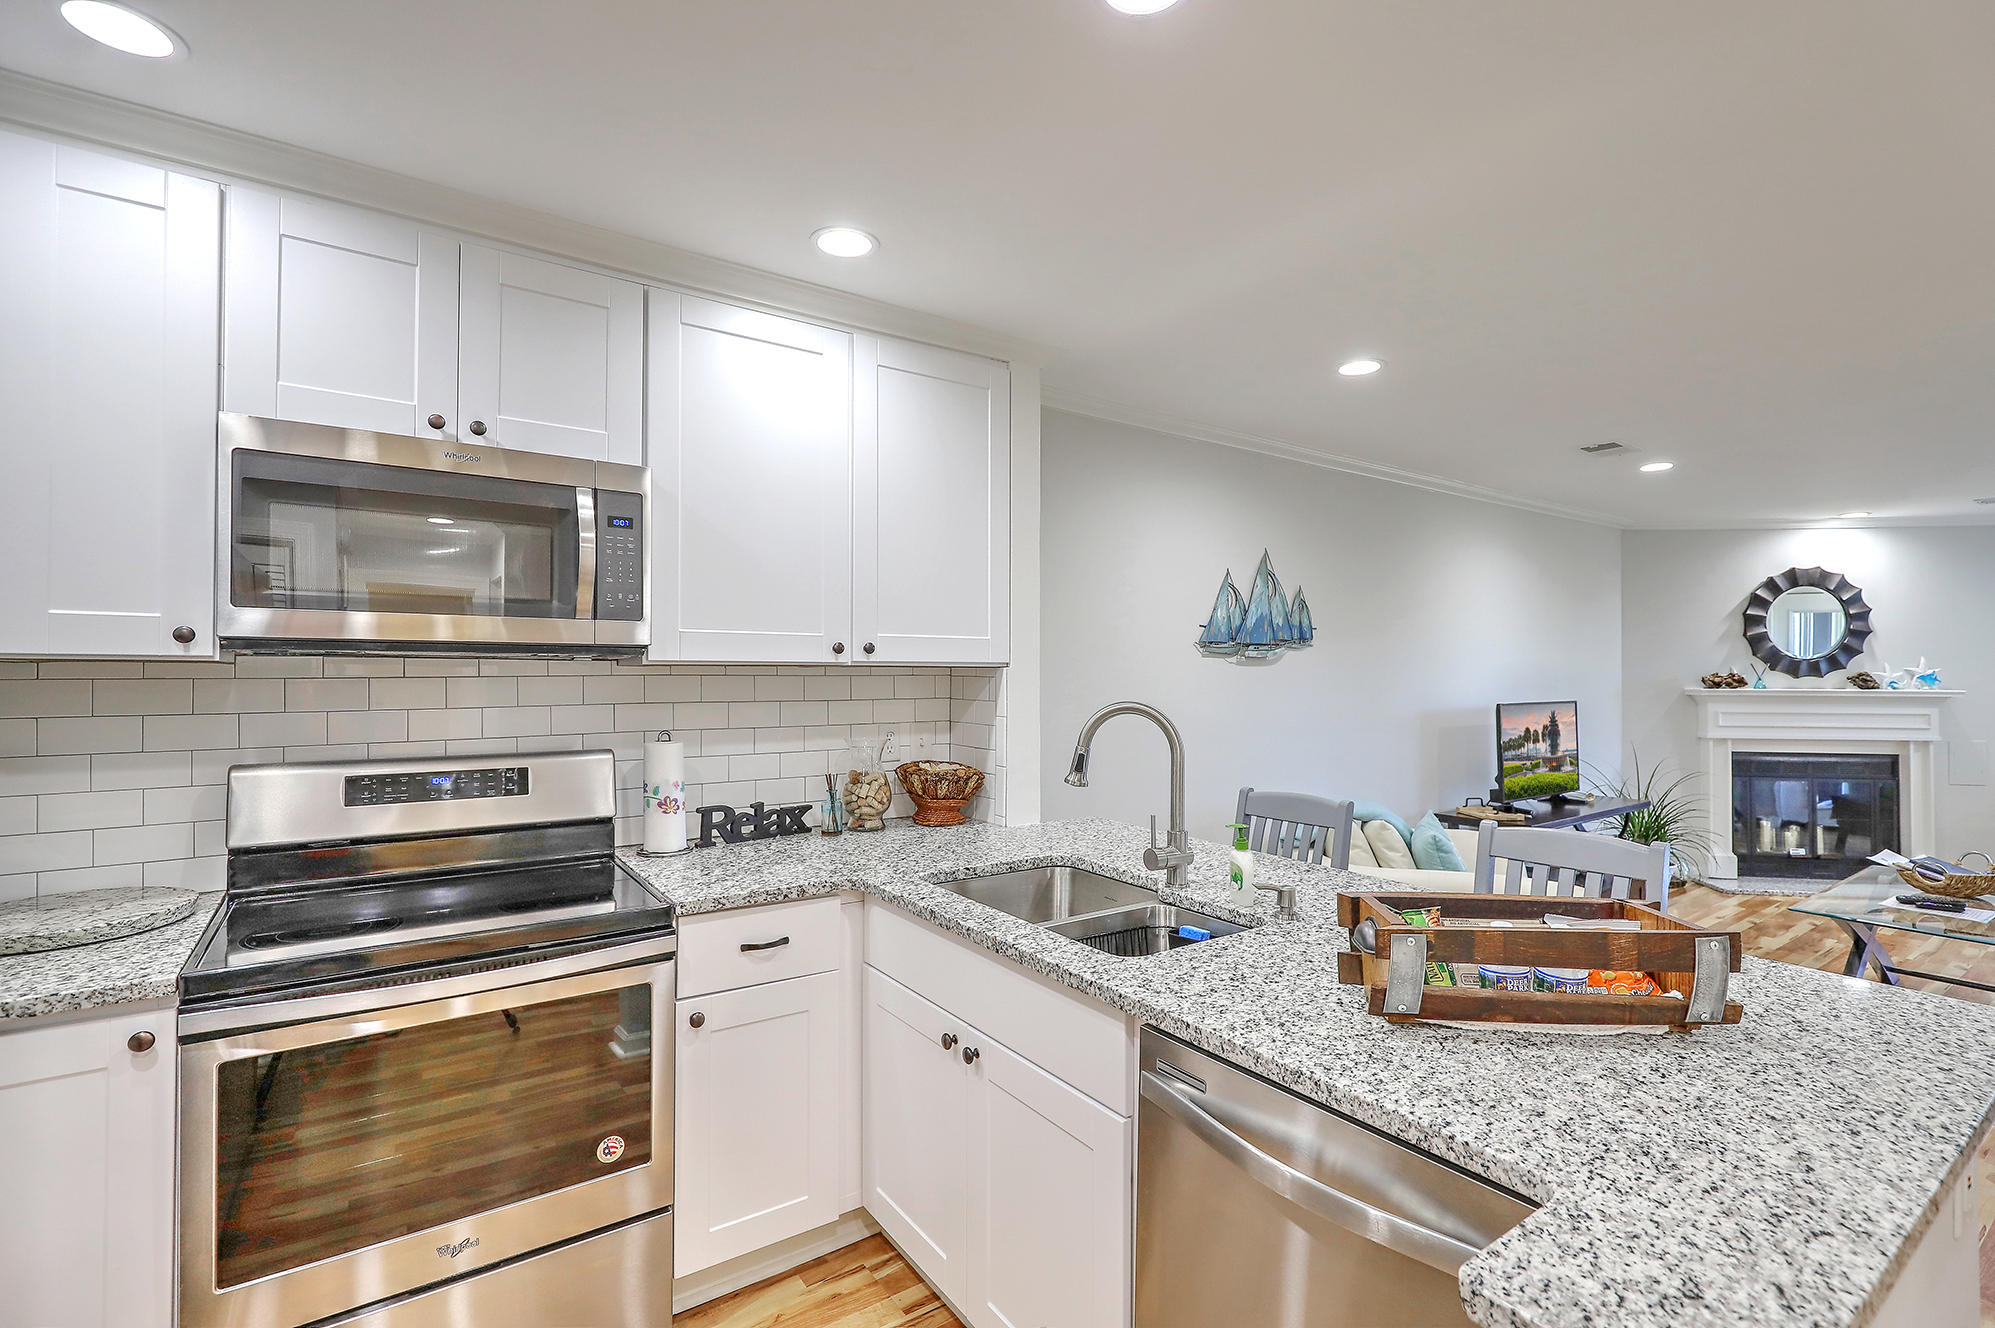 Seabrook Island Homes For Sale - 2103 Landfall, Johns Island, SC - 20